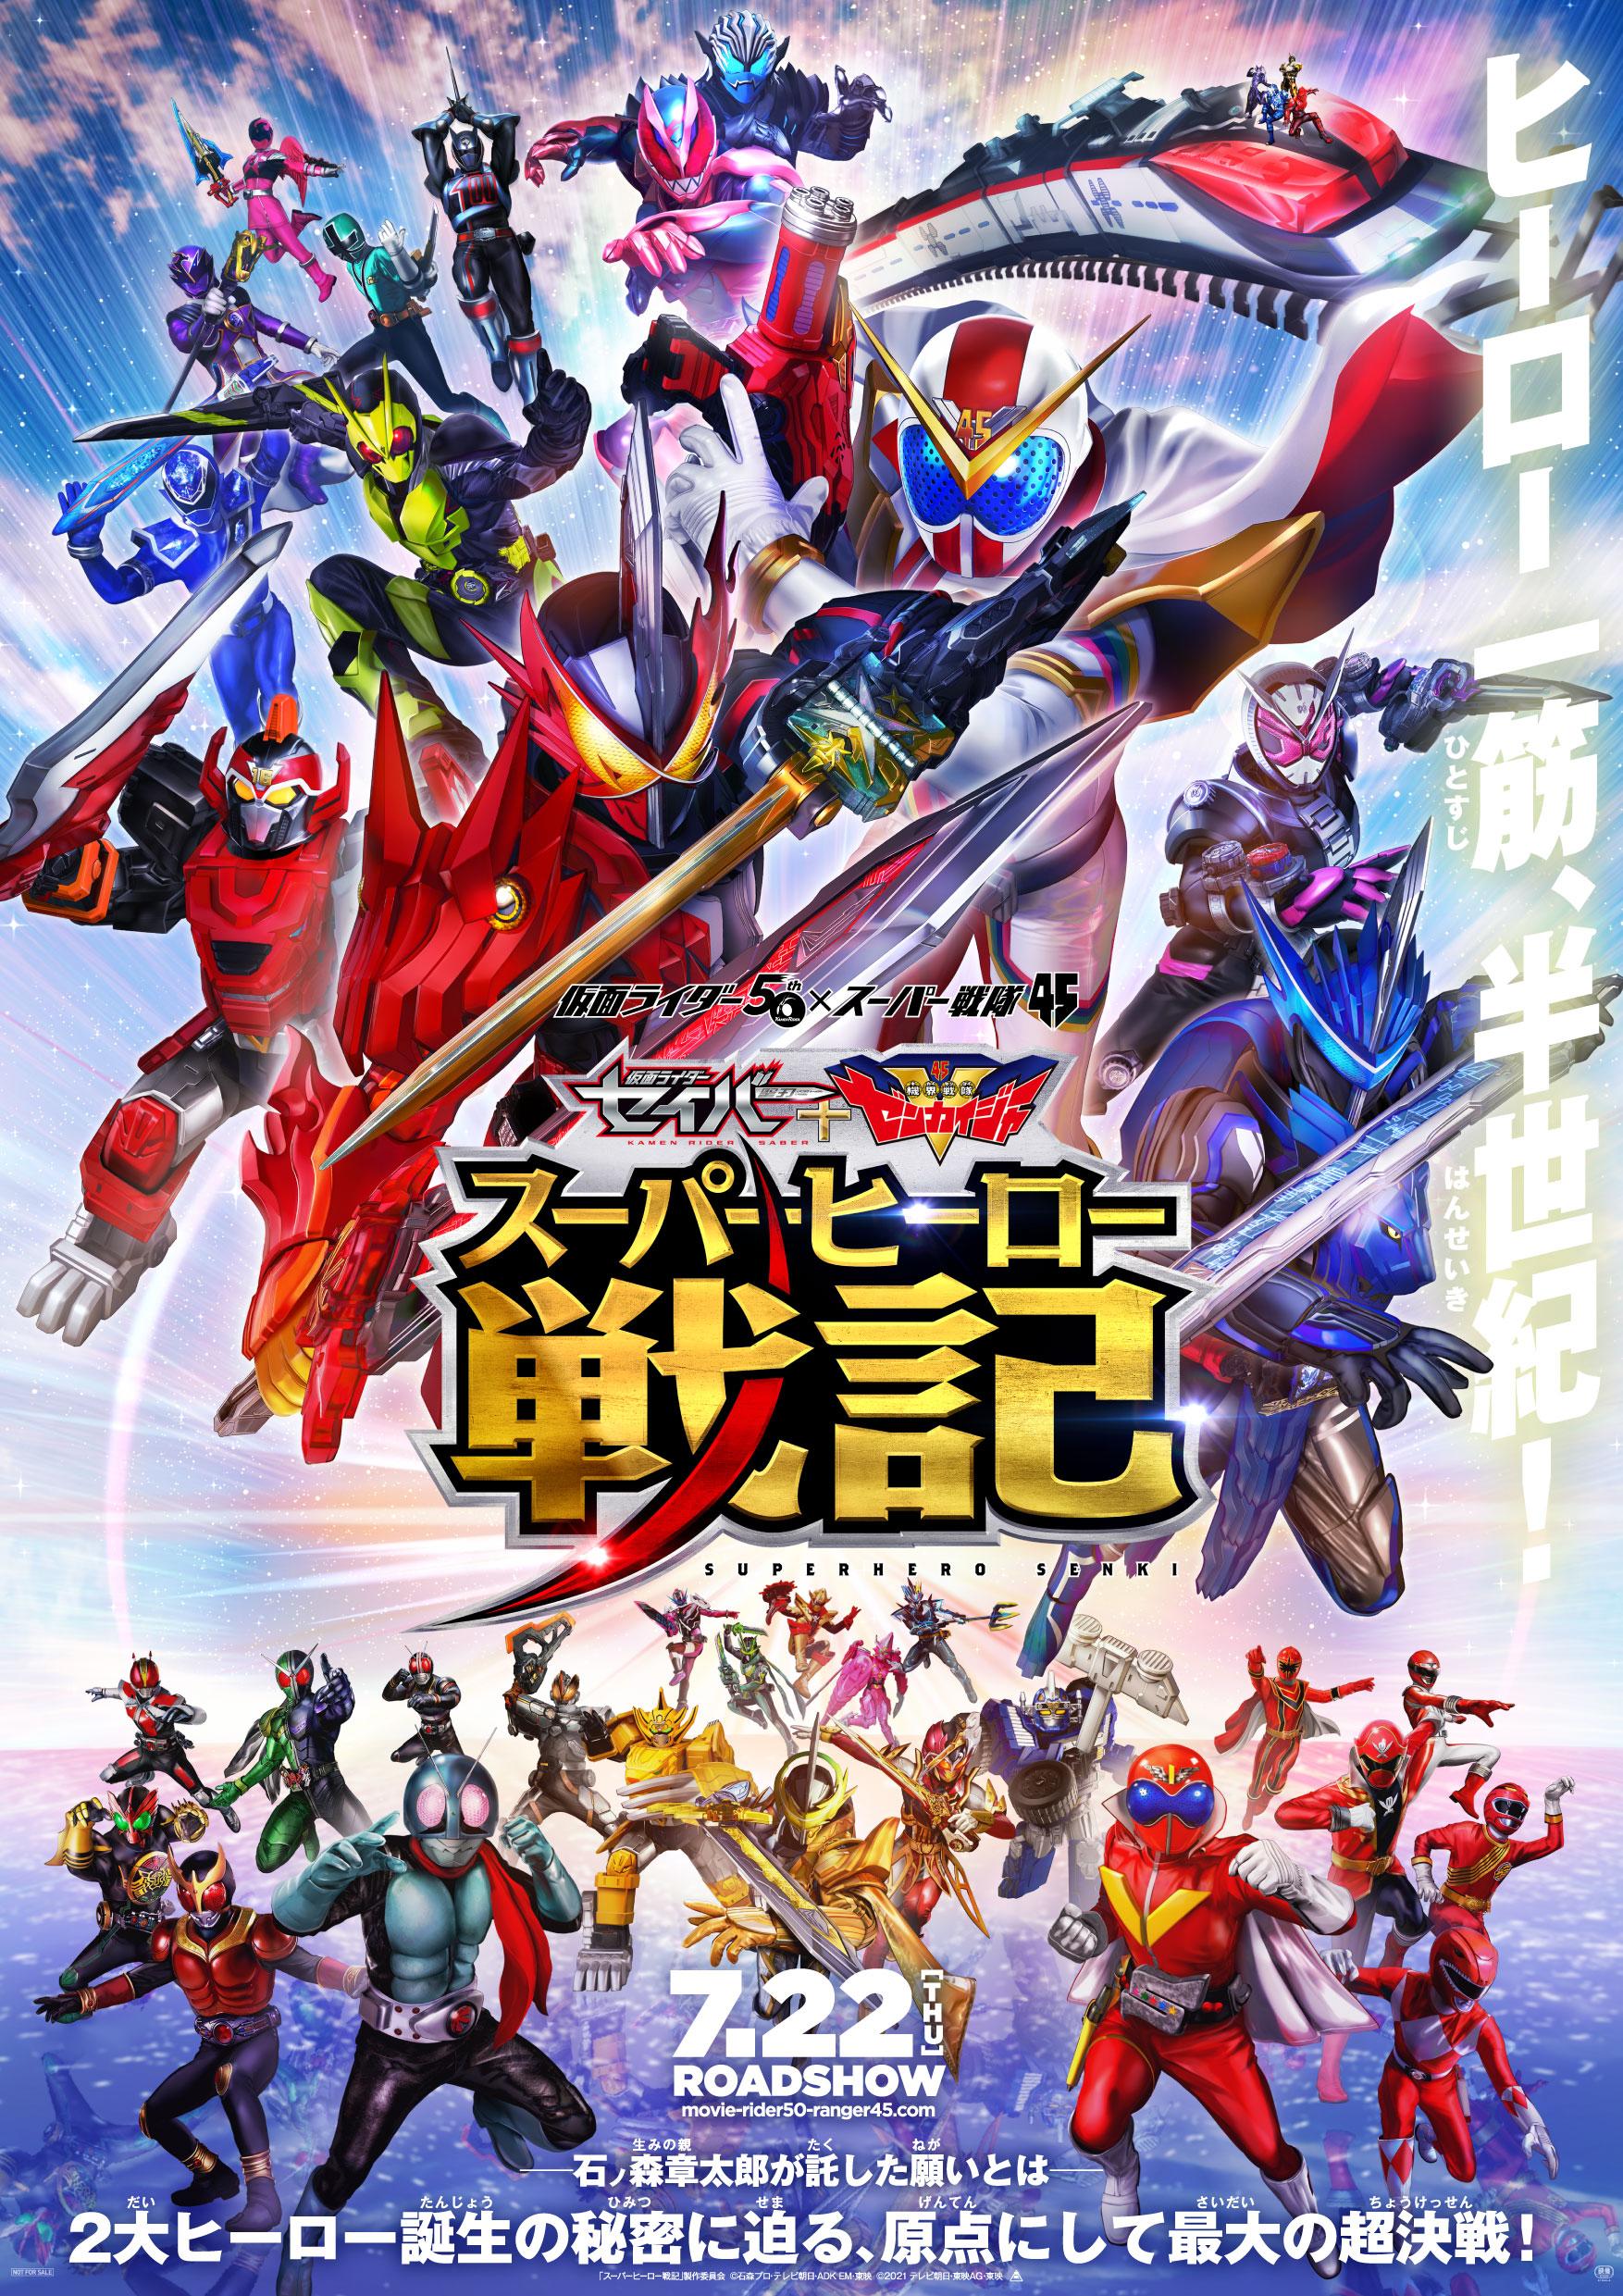 Kamen Rider Saber Kikai Sentai Zenkaiger Superhero Senki Tokupedia Fandom